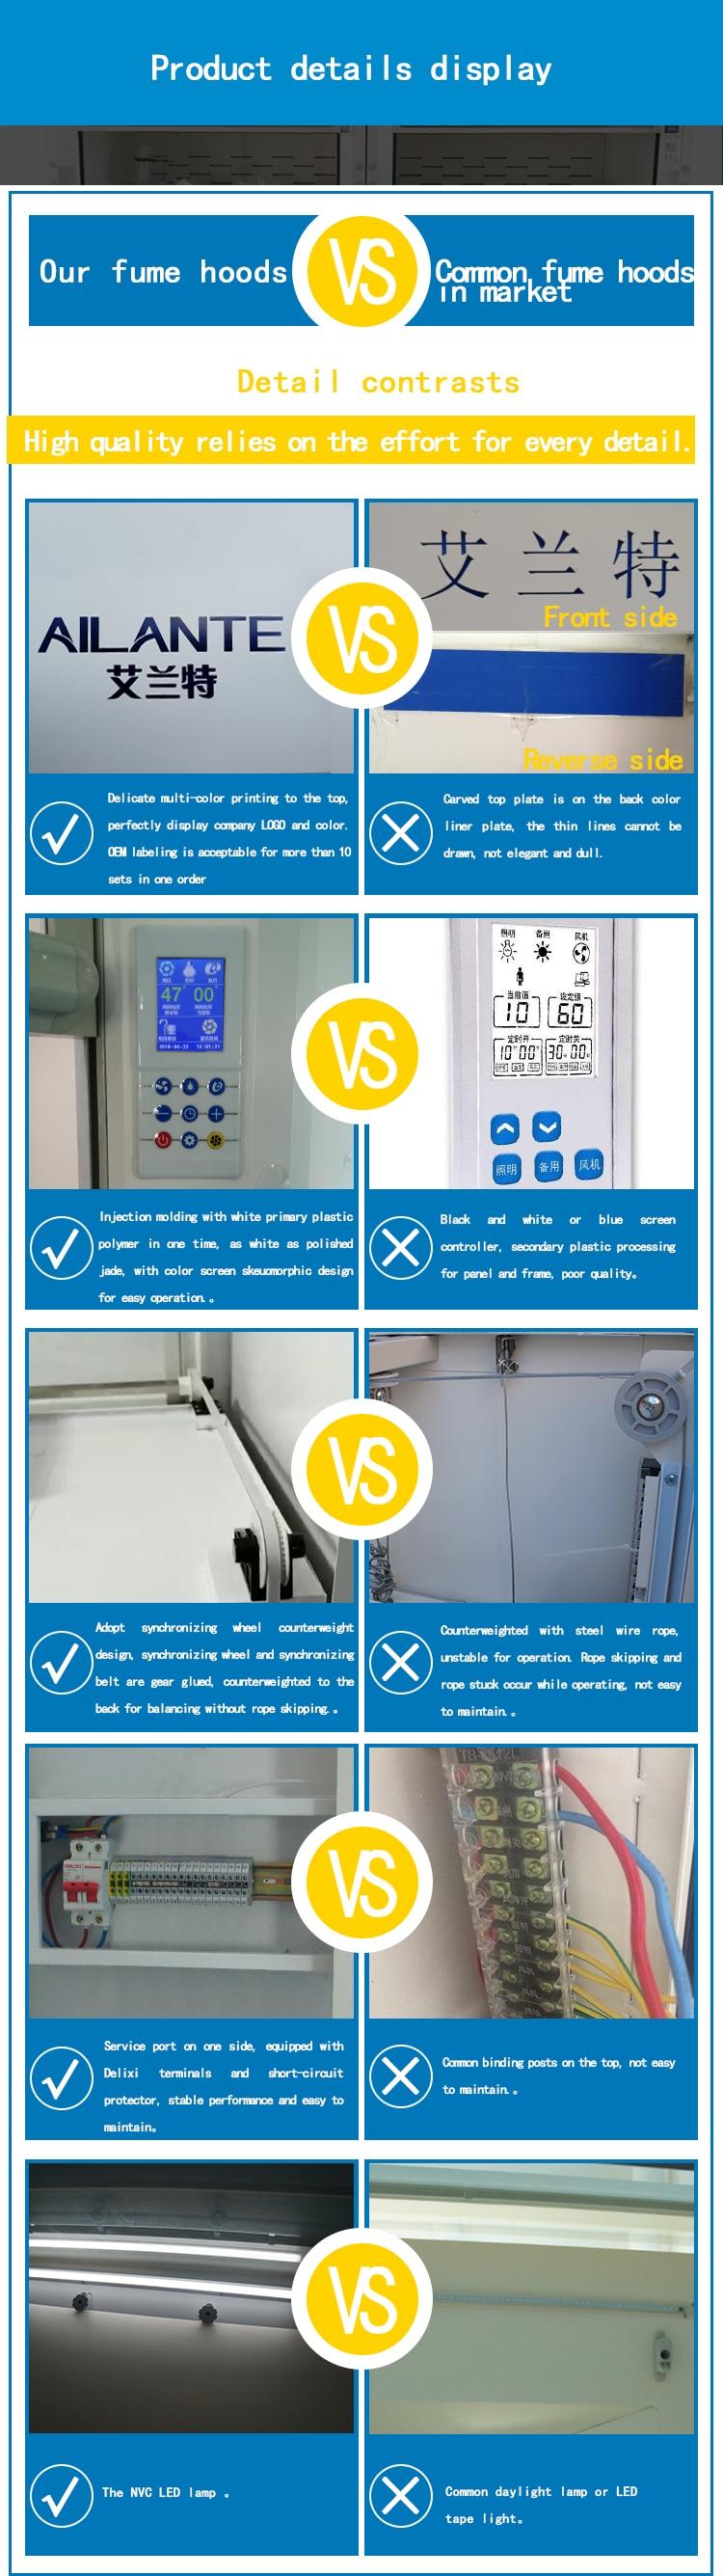 Ailongte лабораторный вытяжной шкаф Вытяжной Шкаф вытяжной шкаф полностью стальной Вытяжной Шкаф вытяжной шкаф